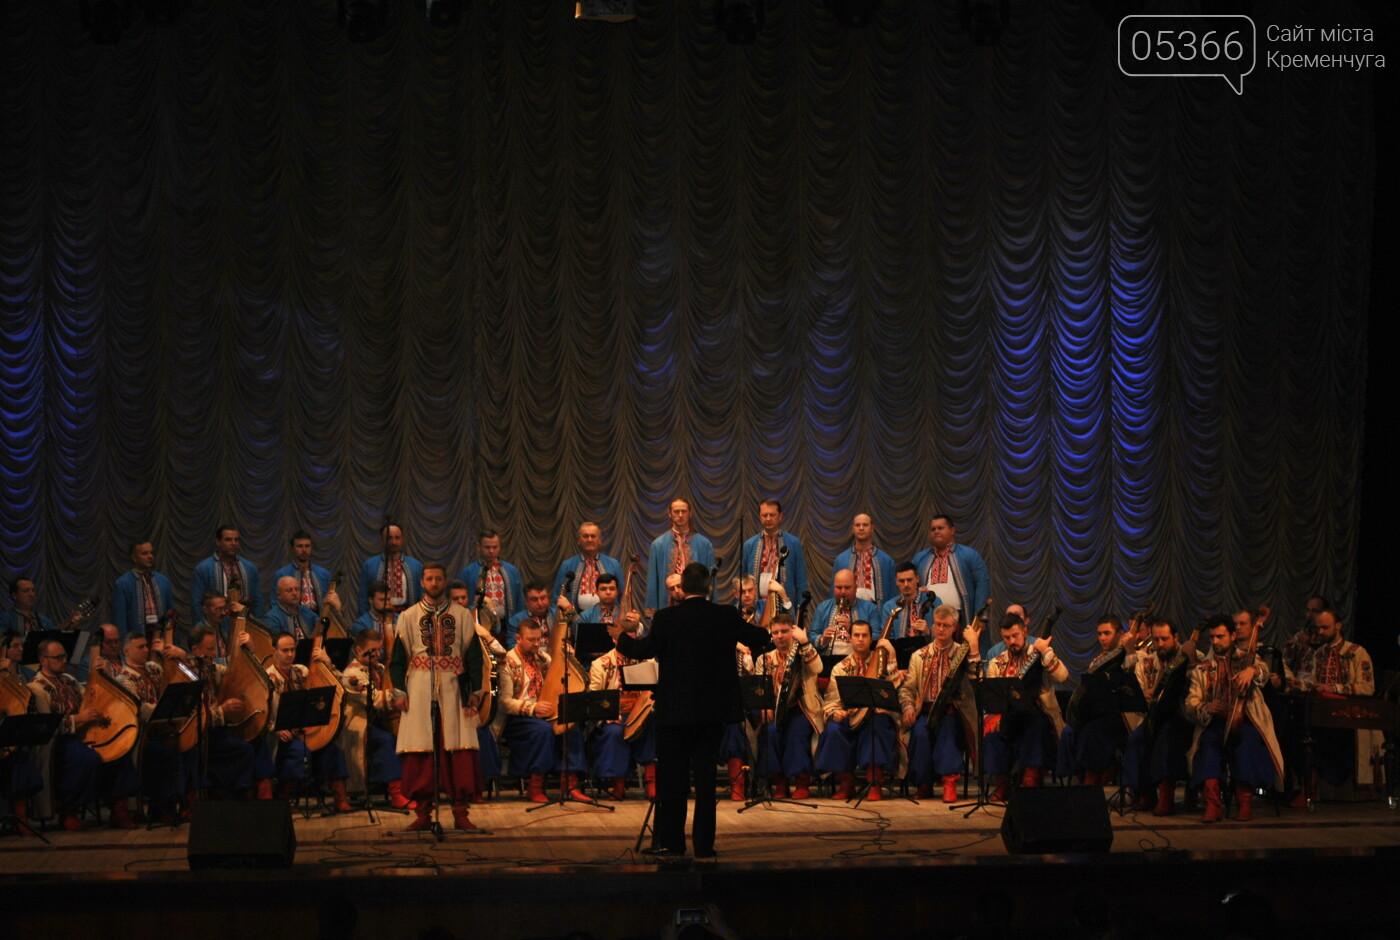 Бандуристи покорили кременчужан своїми виступами та музикою. Фото, фото-5